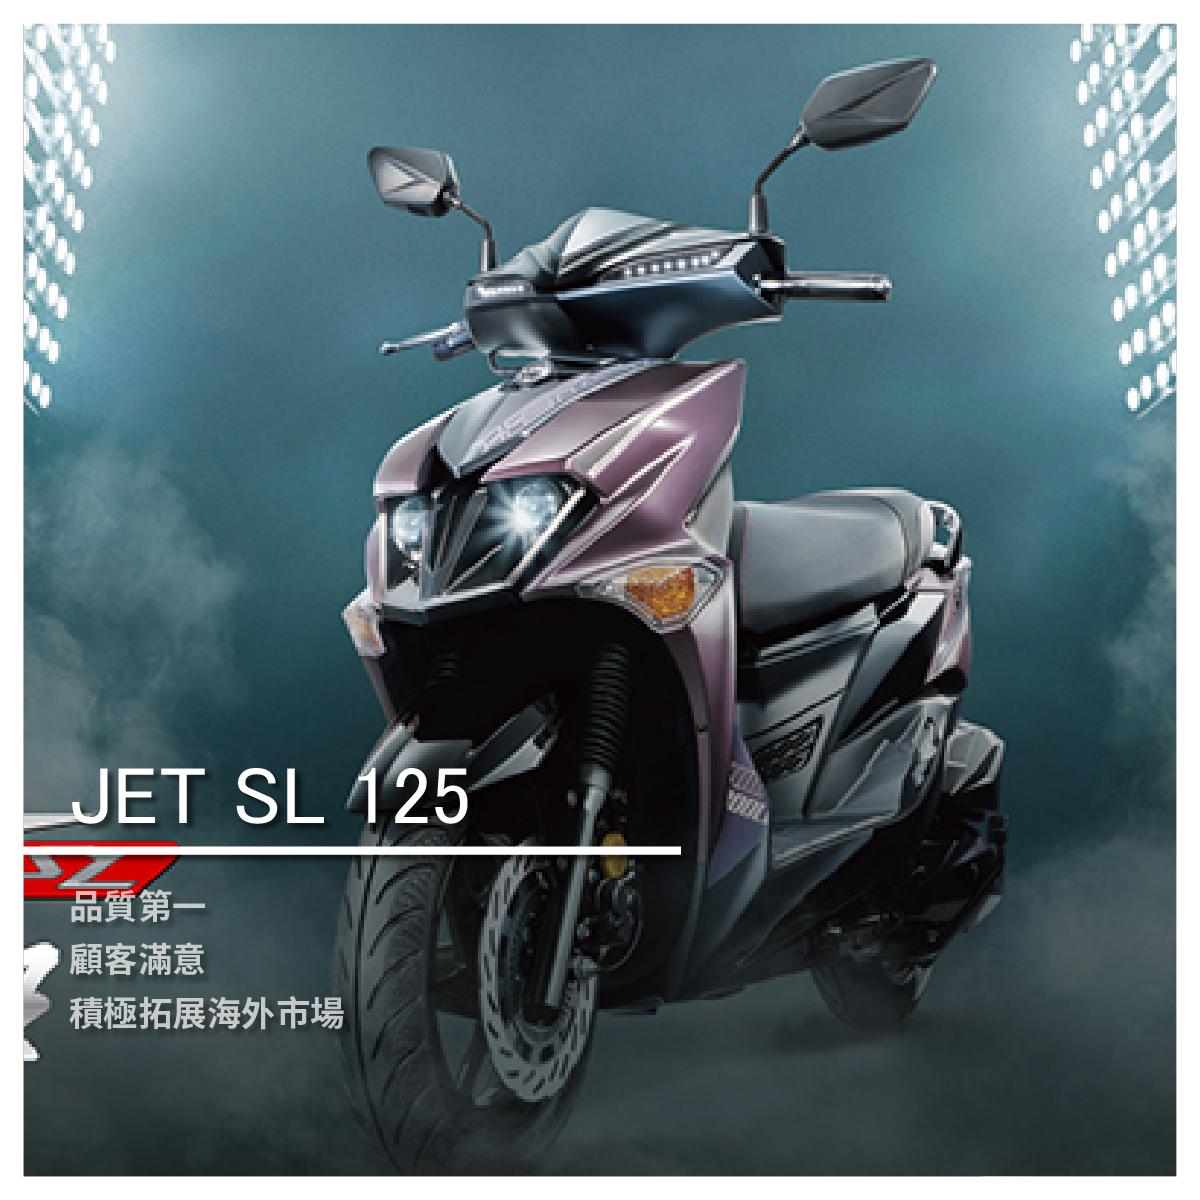 【鋐安車業】SYM 三陽系列 JET SL 125